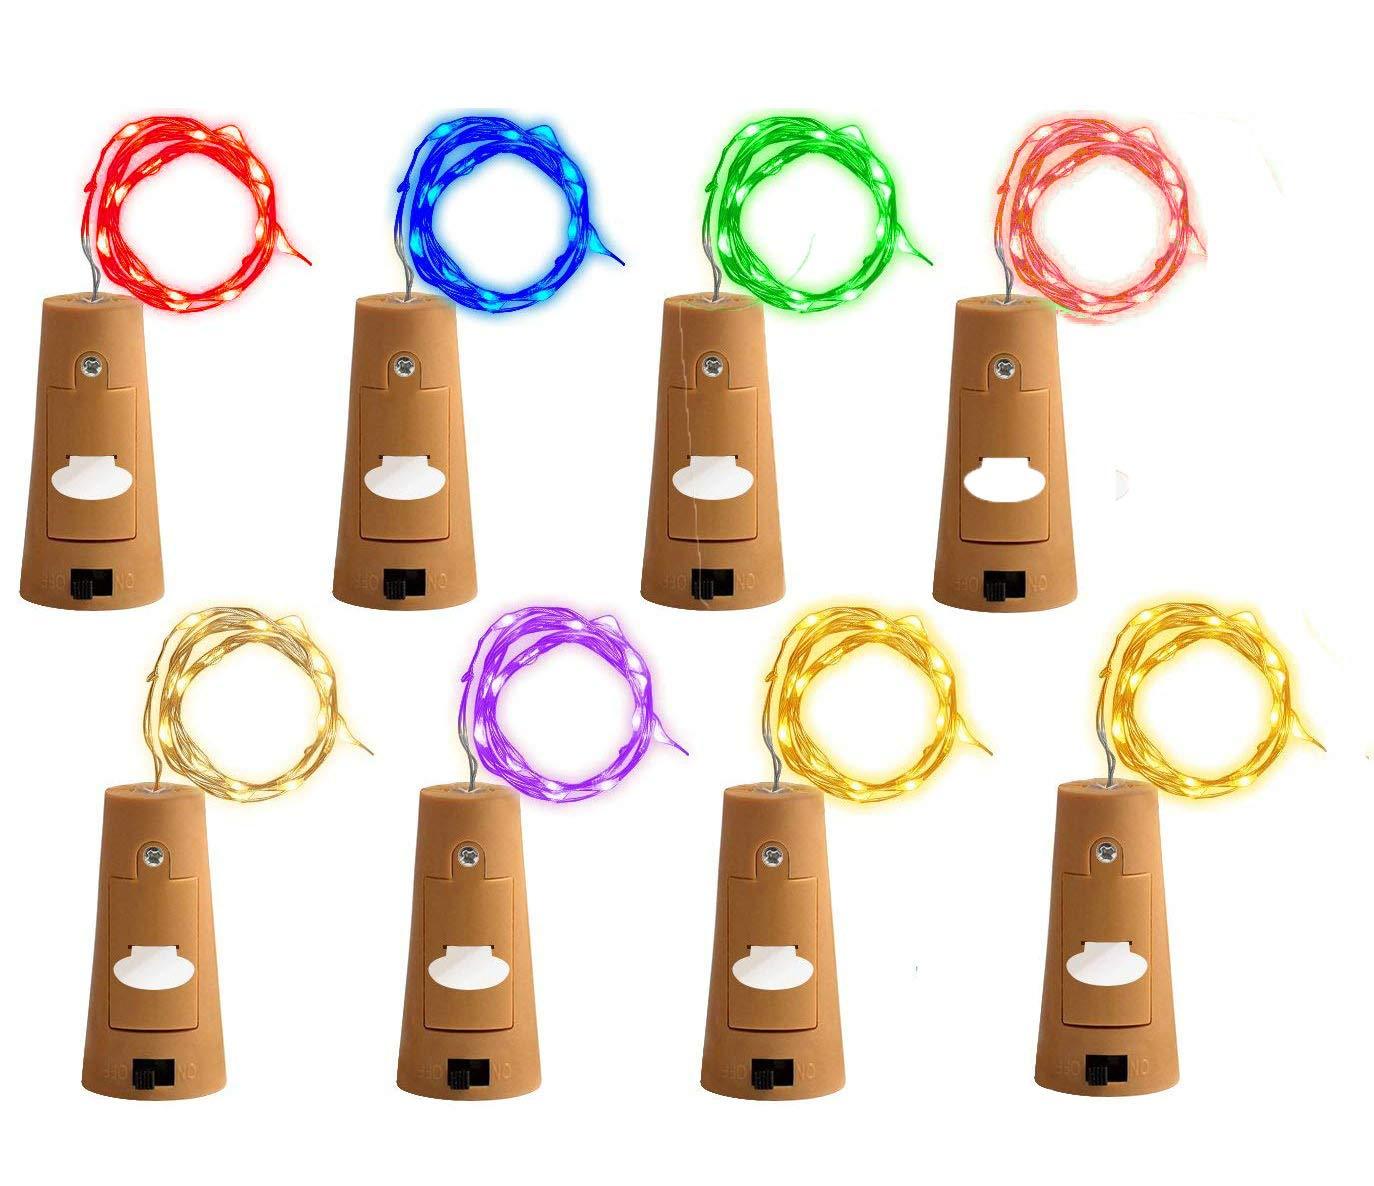 (8 Pack) RENYD Wine Bottle String LED Lights with Cork,Pumpkin Lantern Decorative Lights,LED Cork Lights for Copper Wire Bottle Lights for Party,DIY, Decoration, Christmas, Halloween,Wedding-8 Colors 7172BakezEEL